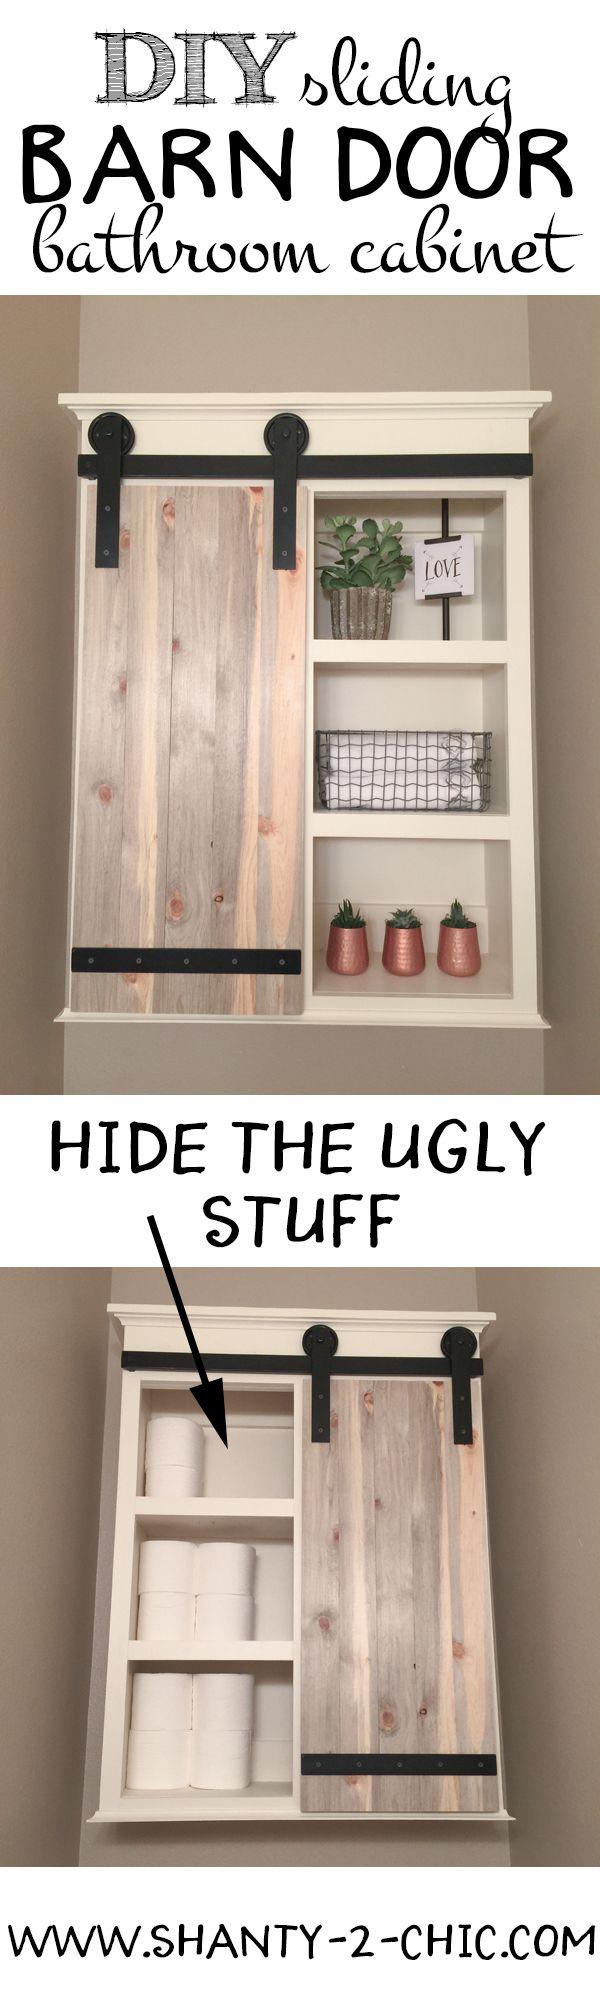 best House Ideas images on Pinterest